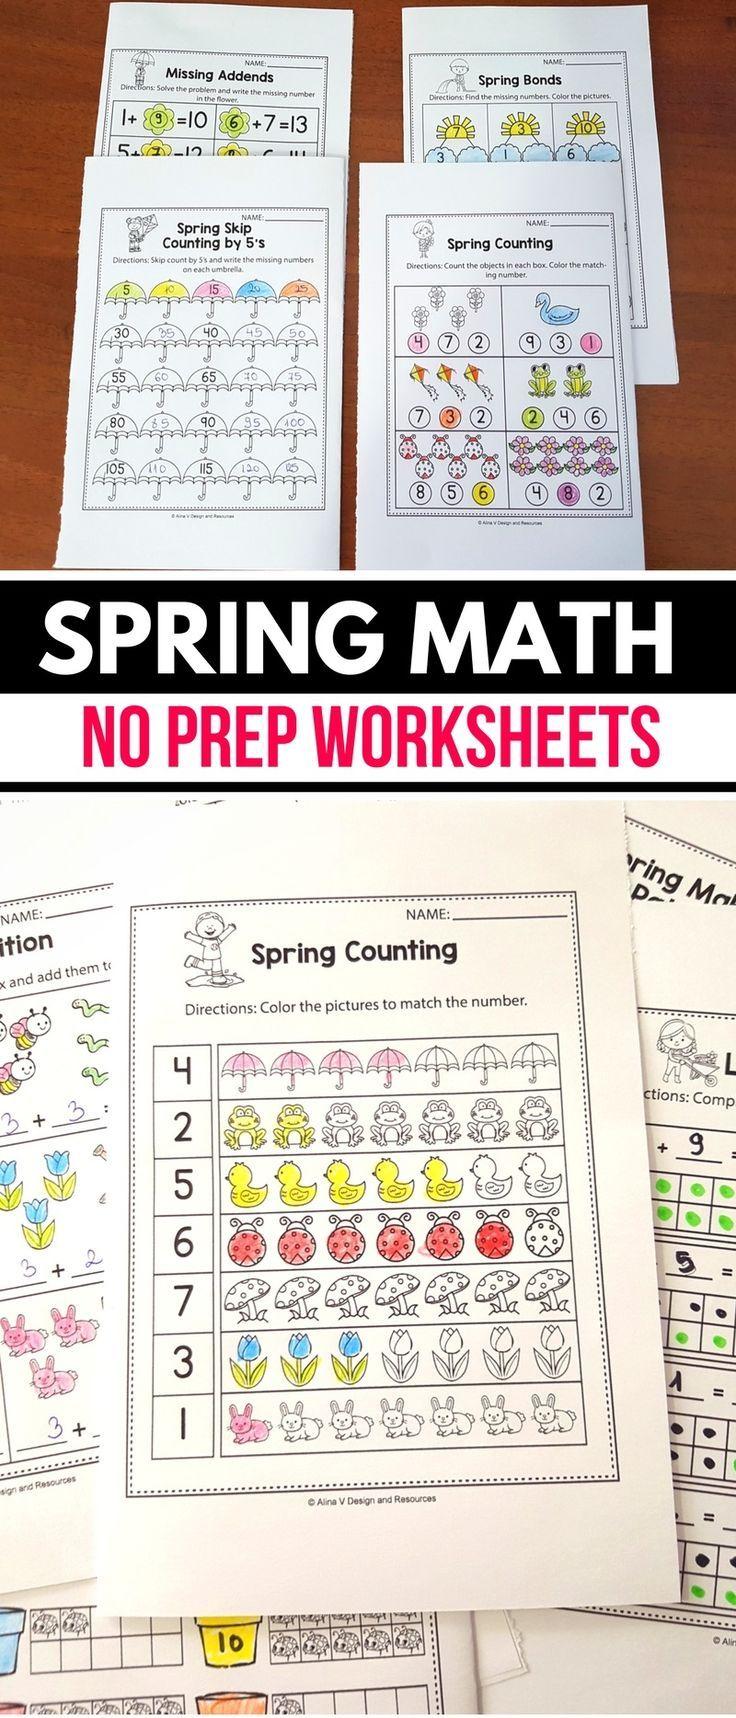 Free Spring Math Worksheets And Activities For Preschool Kindergarten And 1st Grade Kids Spring Math Worksheets Kindergarten Math Worksheets Math Worksheets [ 1718 x 736 Pixel ]